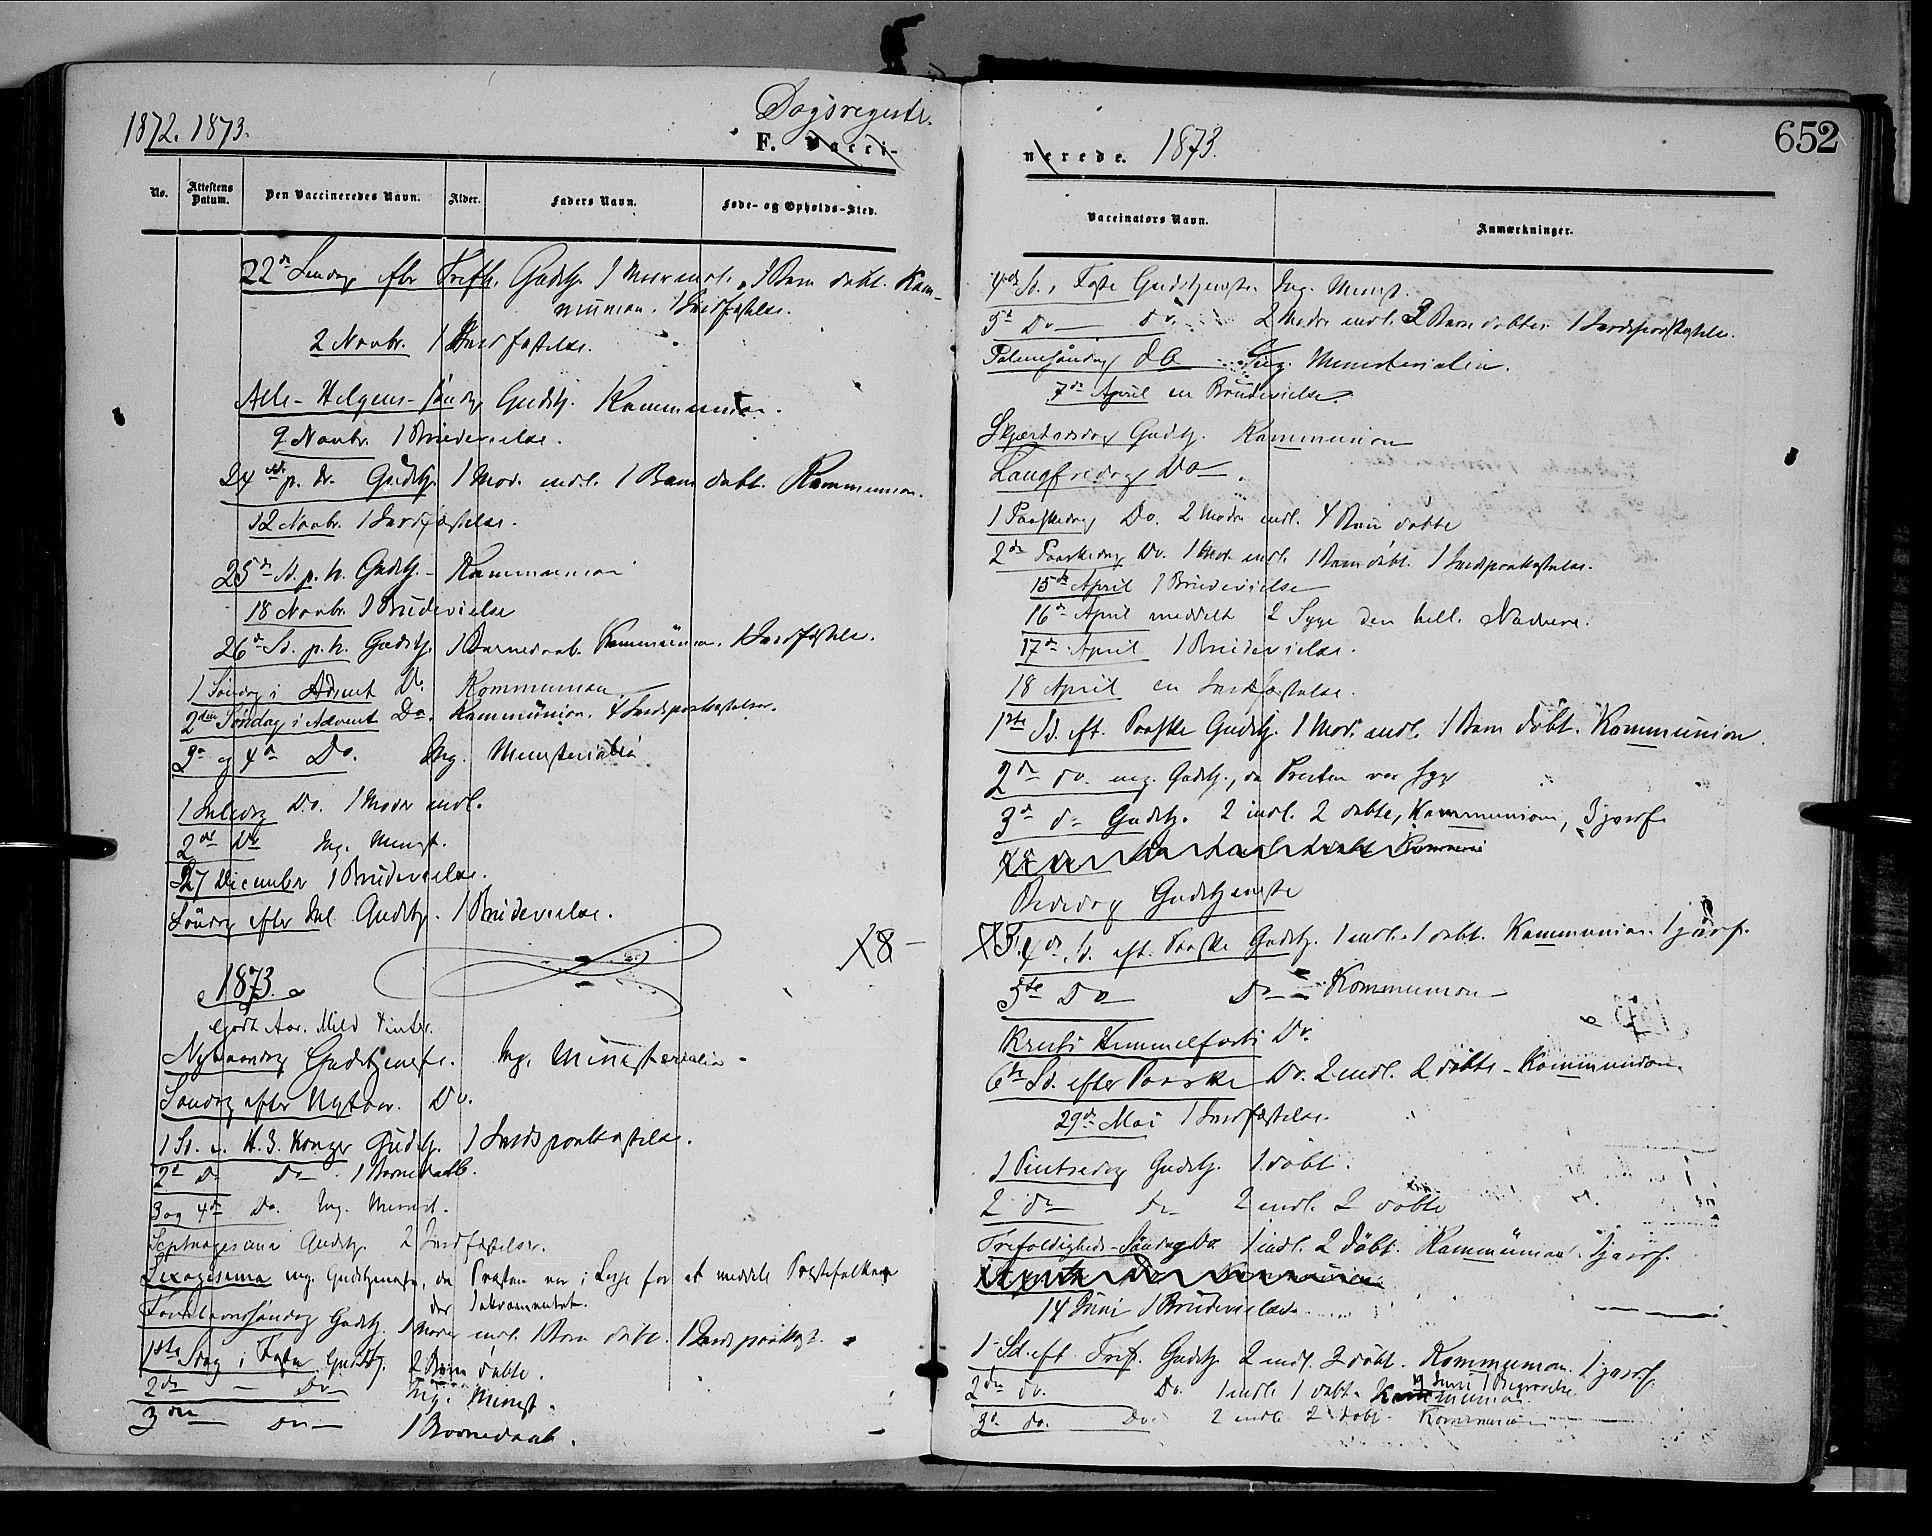 SAH, Dovre prestekontor, Parish register (official) no. 1, 1854-1878, p. 652